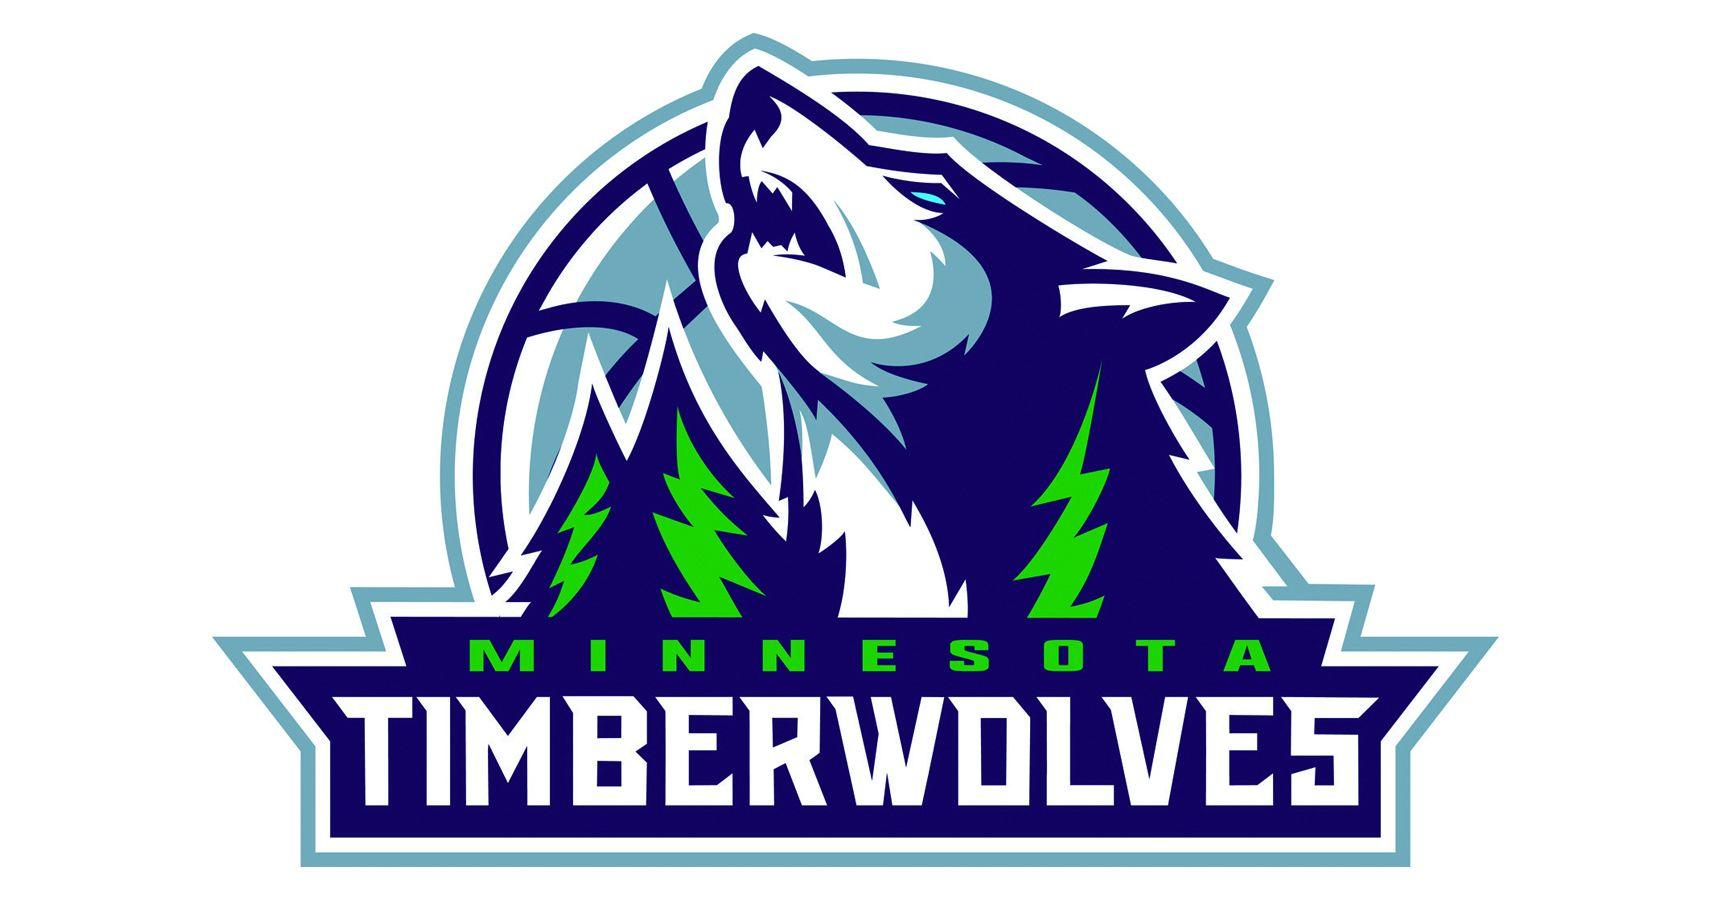 Google News - Minnesota Timberwolves unveil Prince inspired uniform -  Overview 3b5bd5620